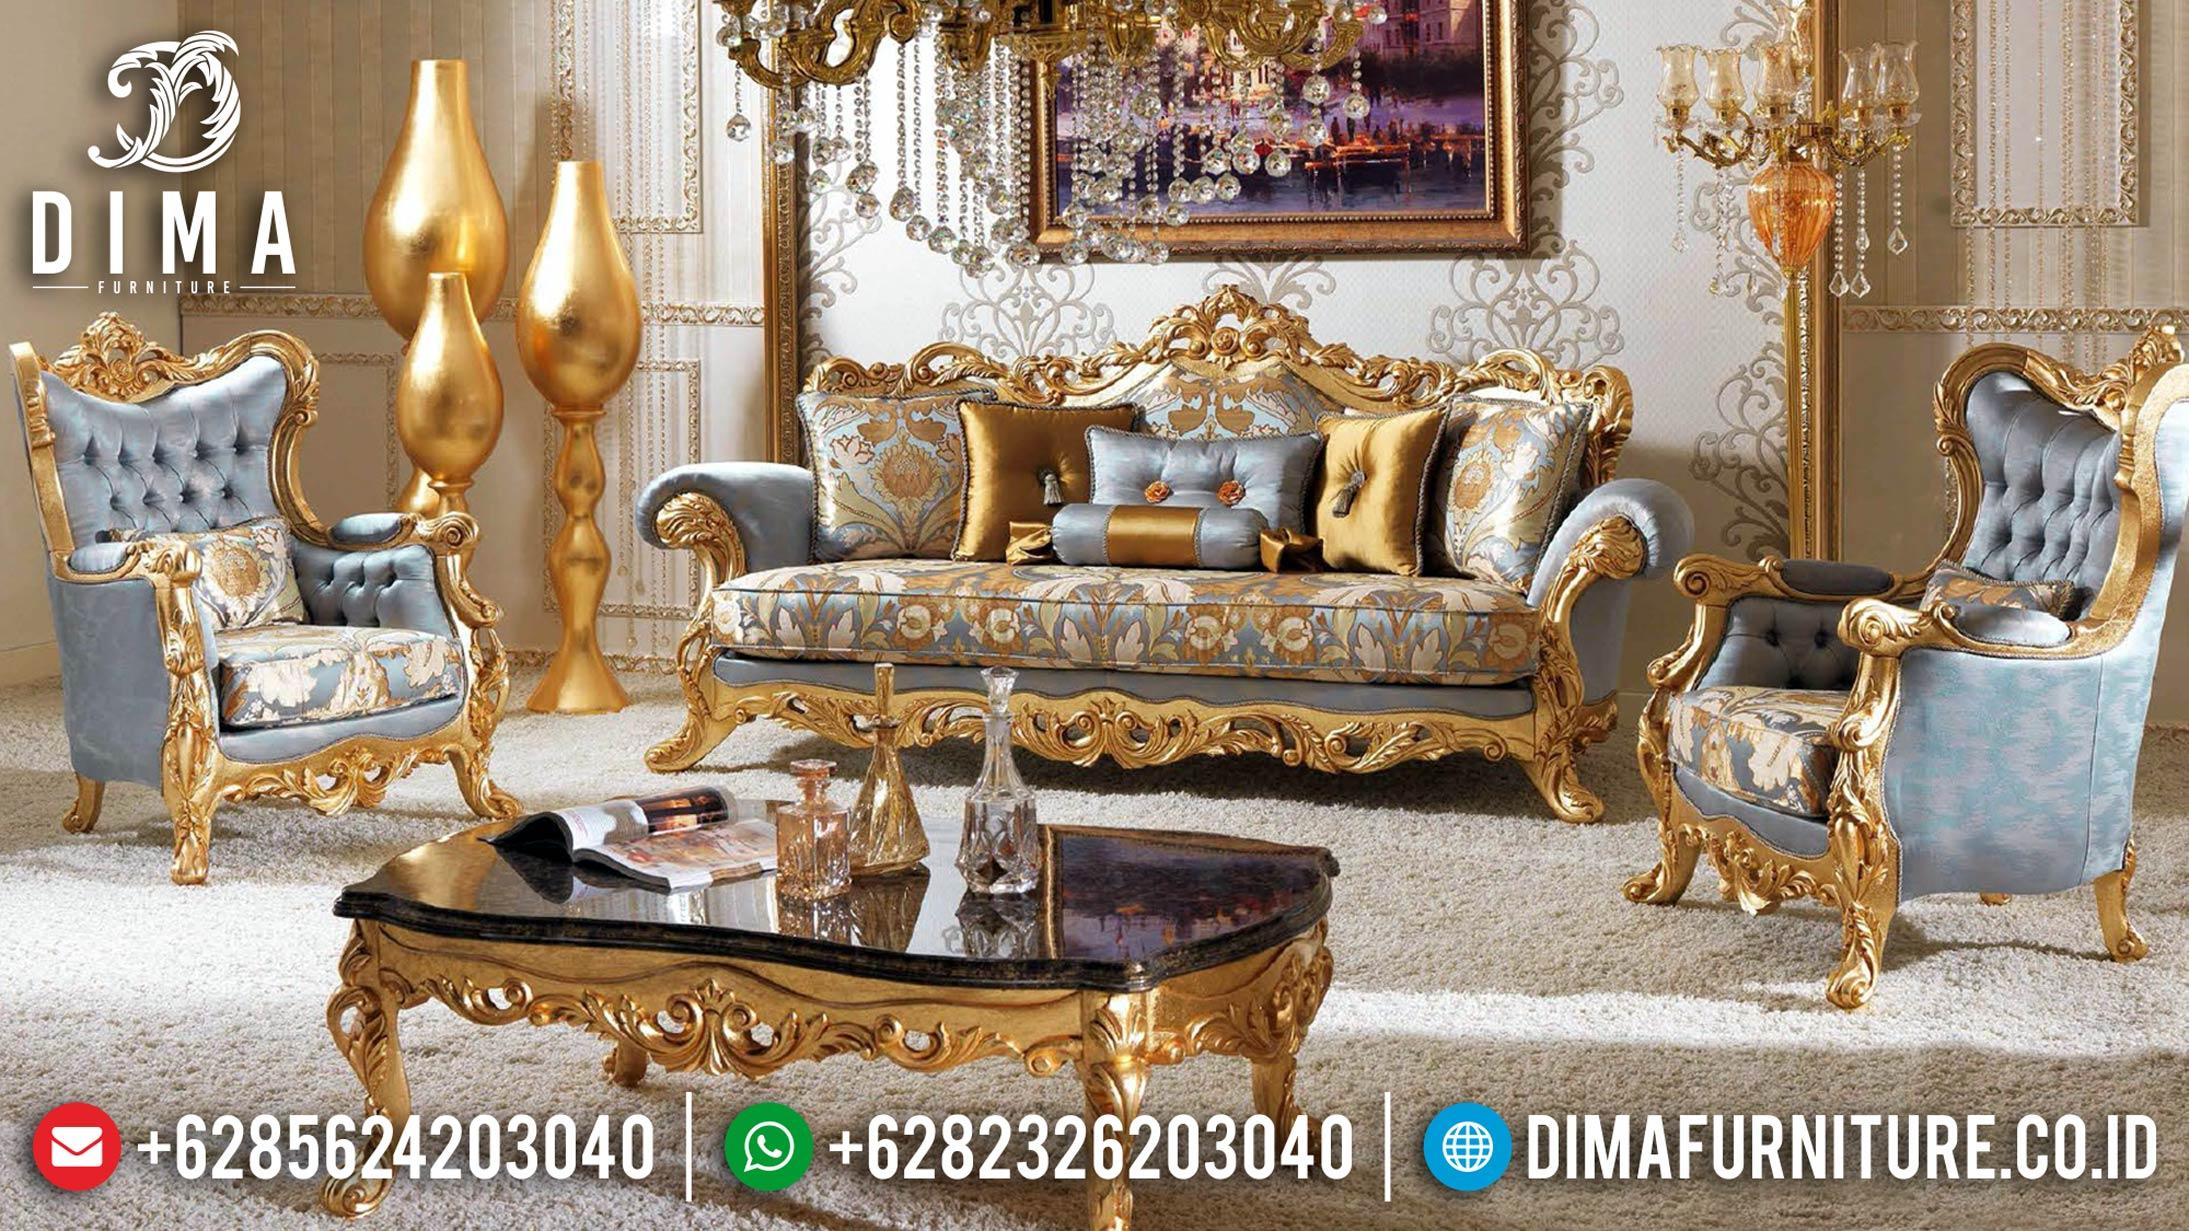 New Set Gold 3 1 1 Sofa Tamu Mewah Ukiran Jepara Klasik Turkey DF-1216